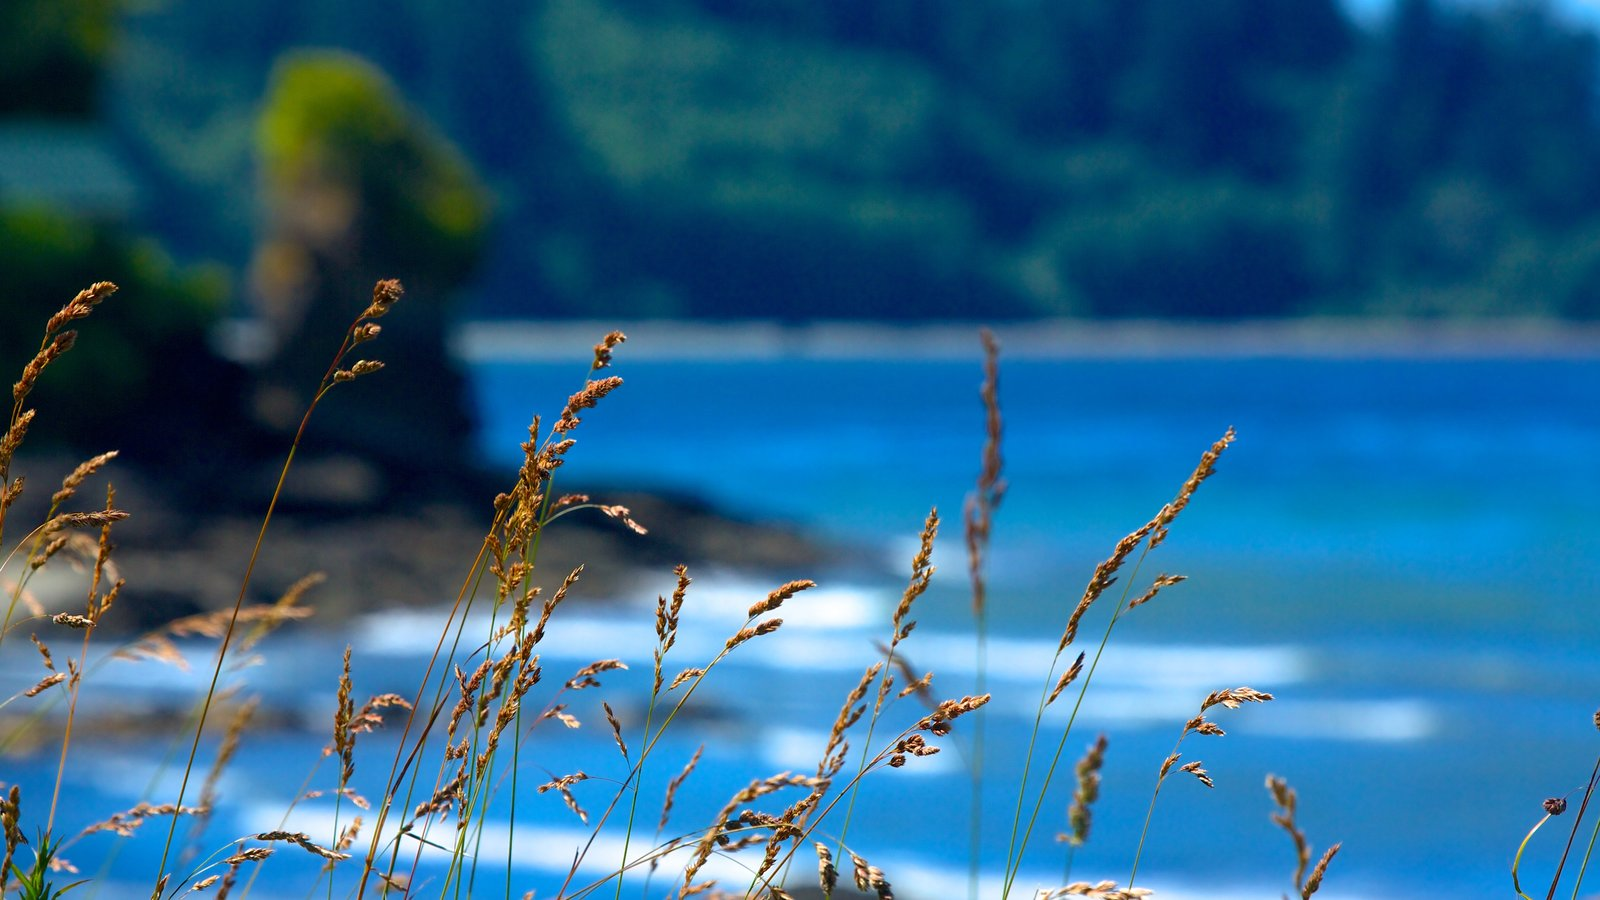 Olympic National Park caracterizando paisagens litorâneas